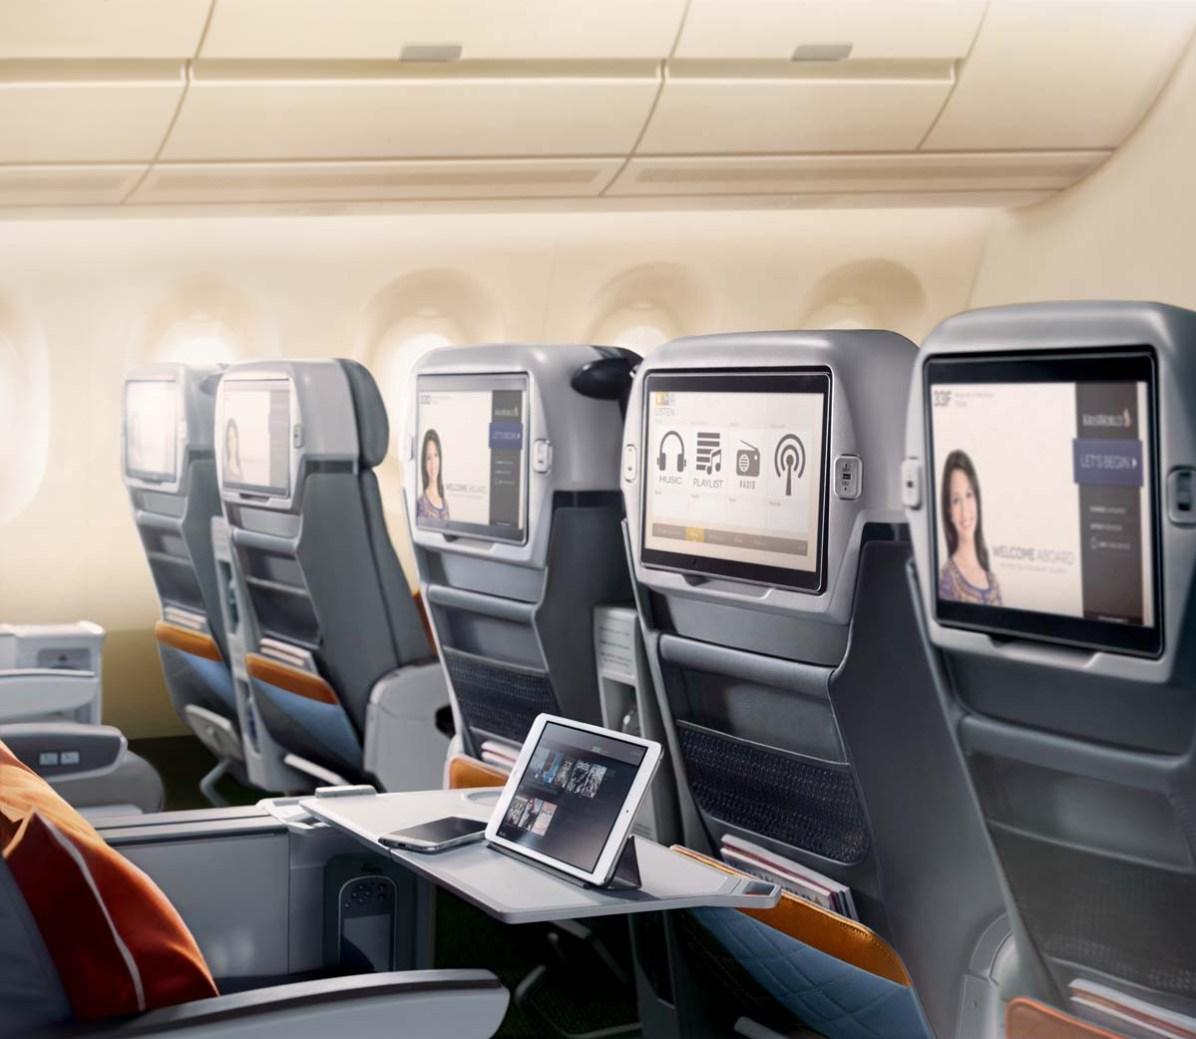 bildschirm-premium-eonomy-class-singapore-airlines